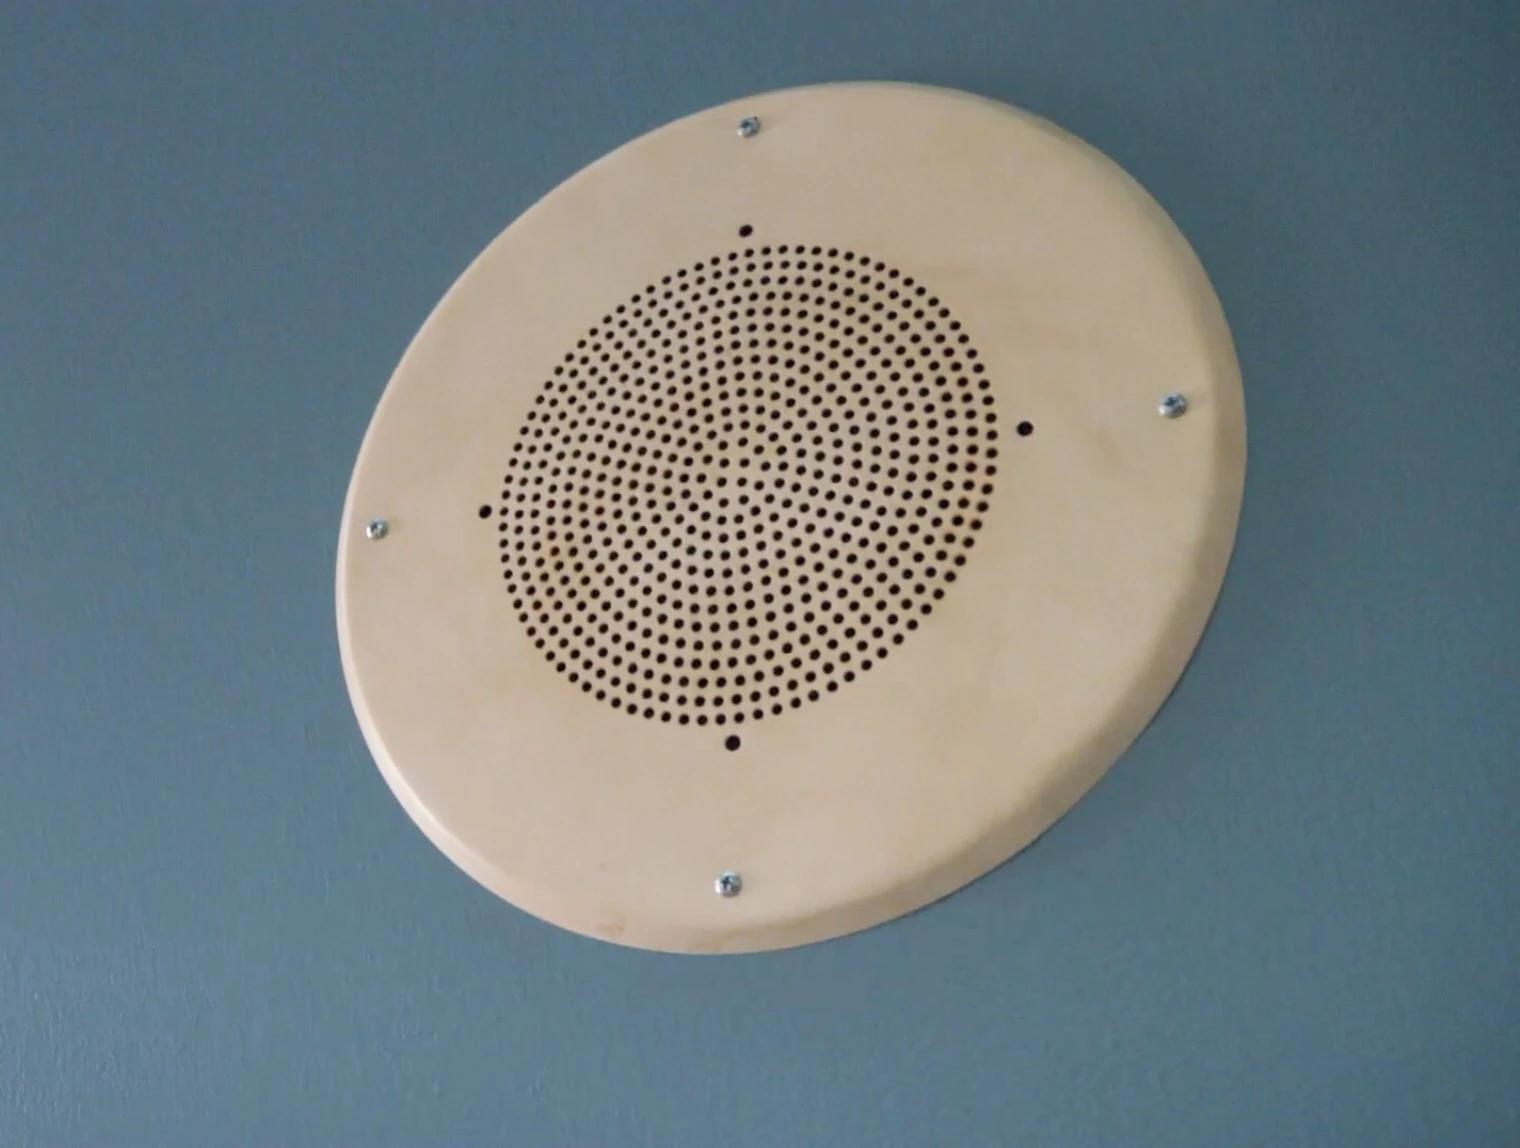 An intercom speaker